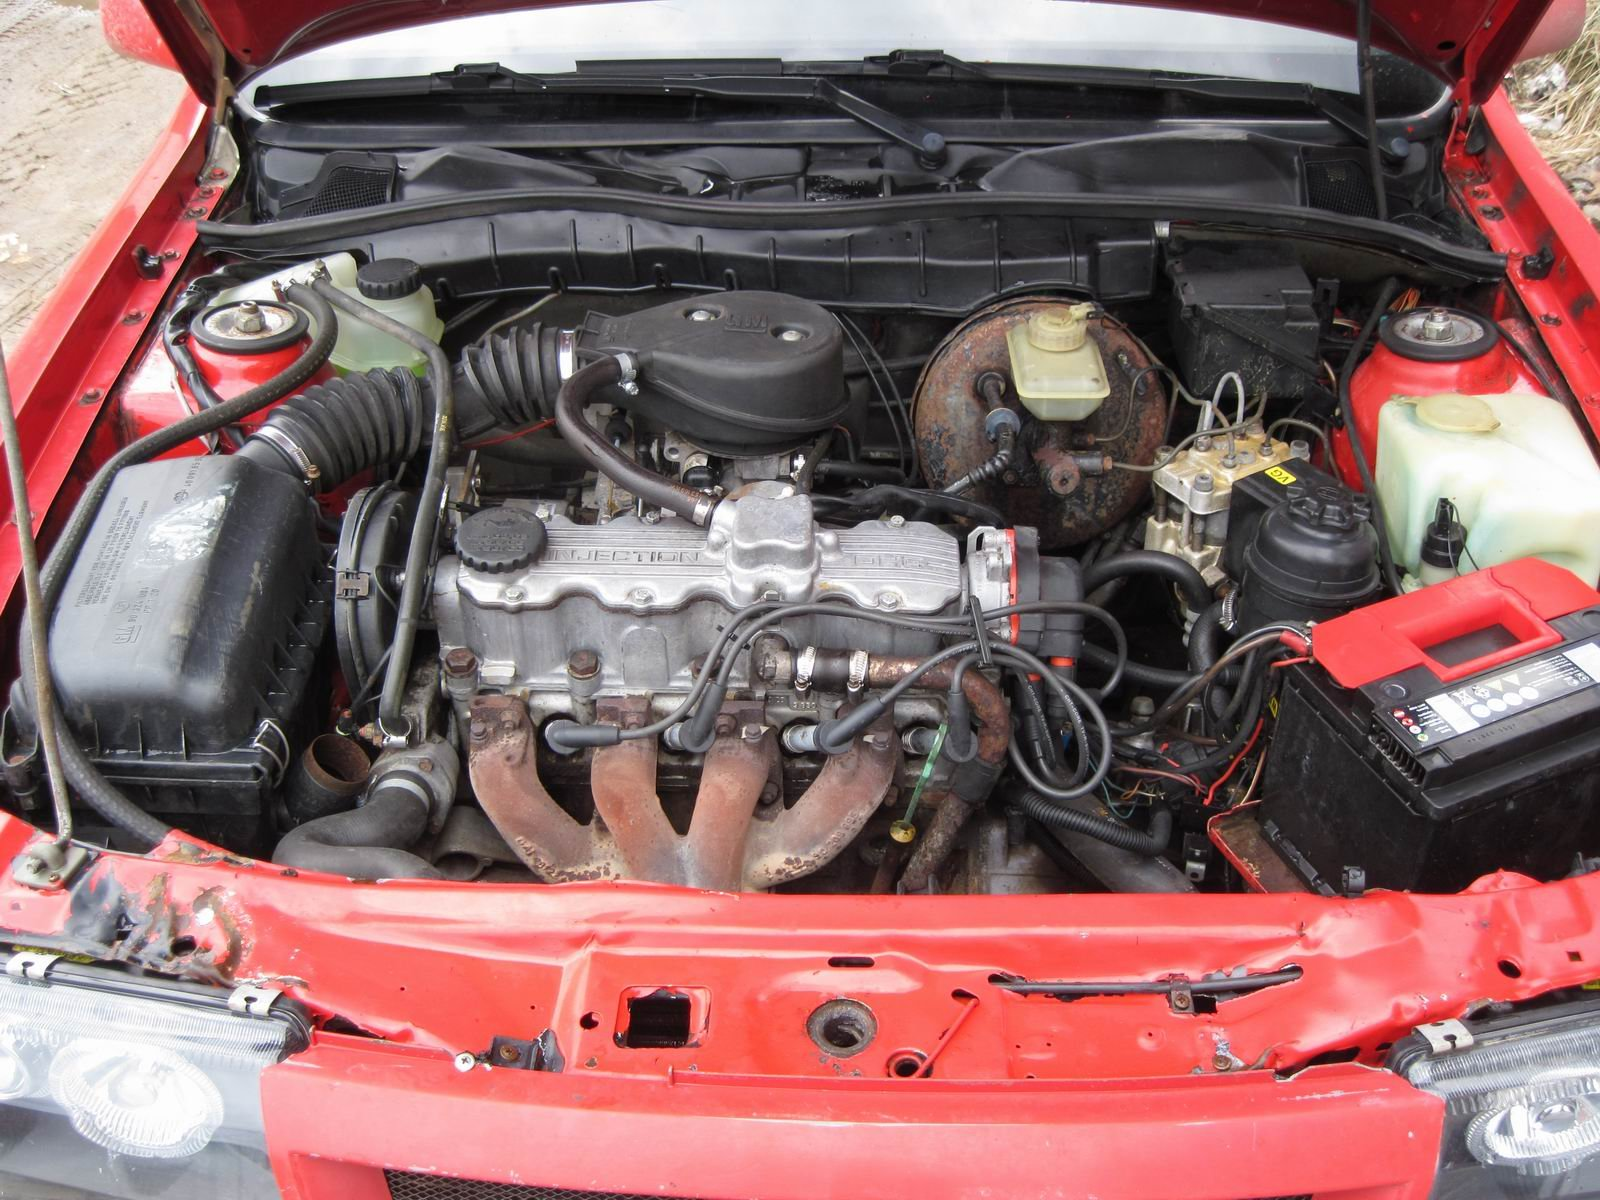 картинки двигателей опель вектра панамки рафии крючком